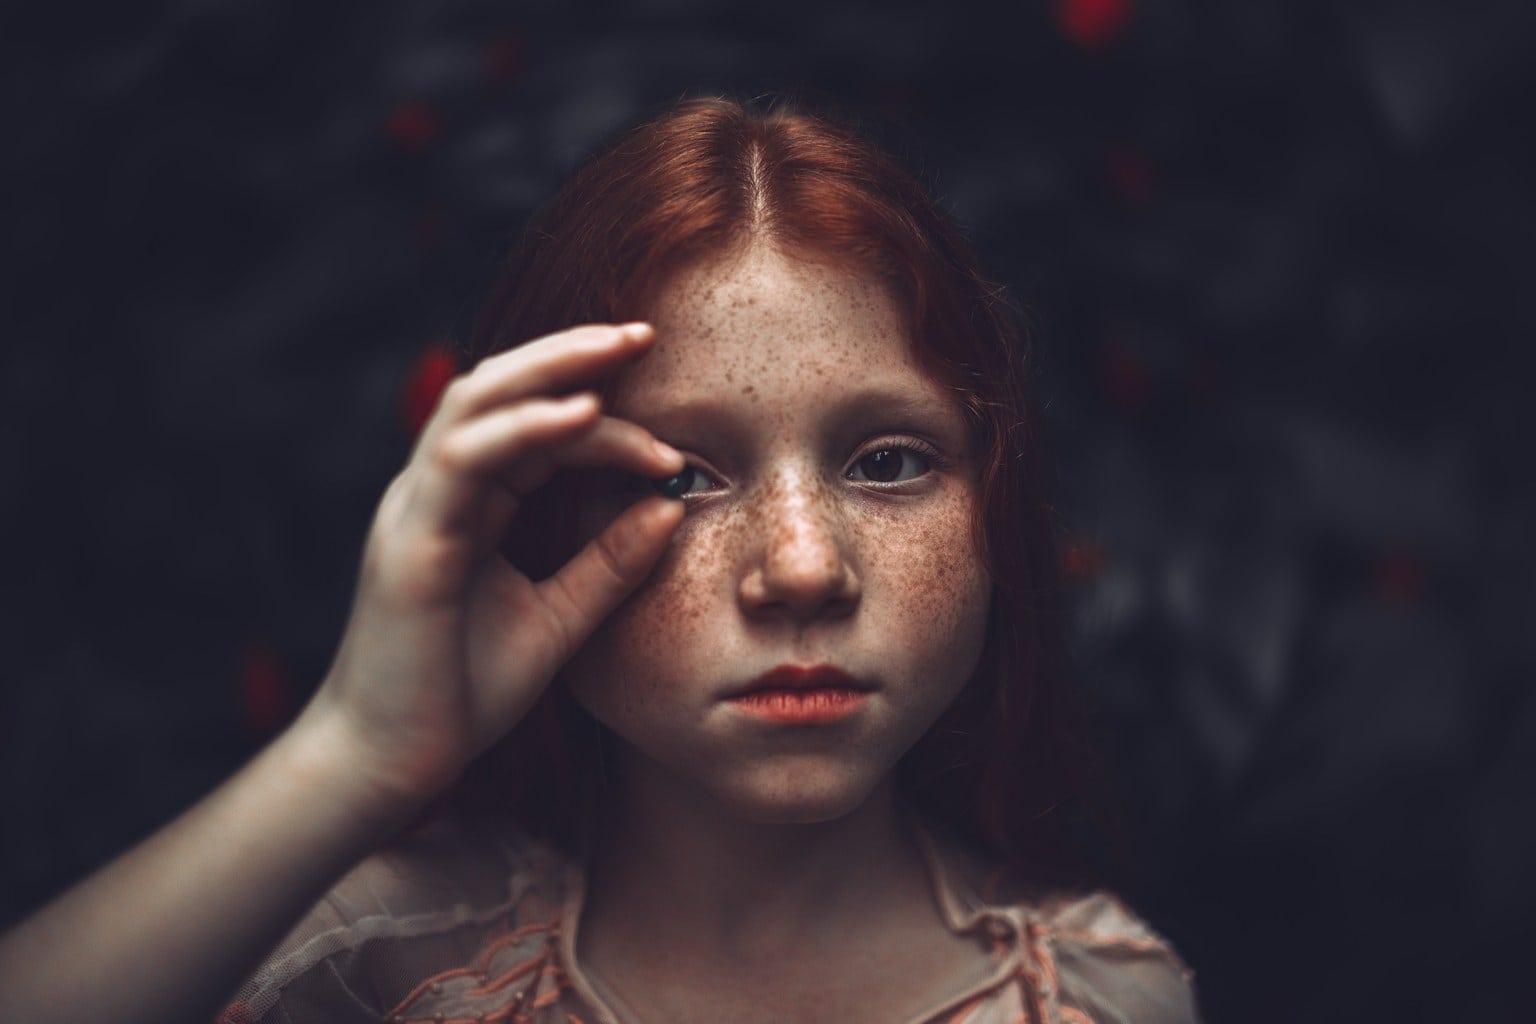 Retrato de niña pelirroja y pecas